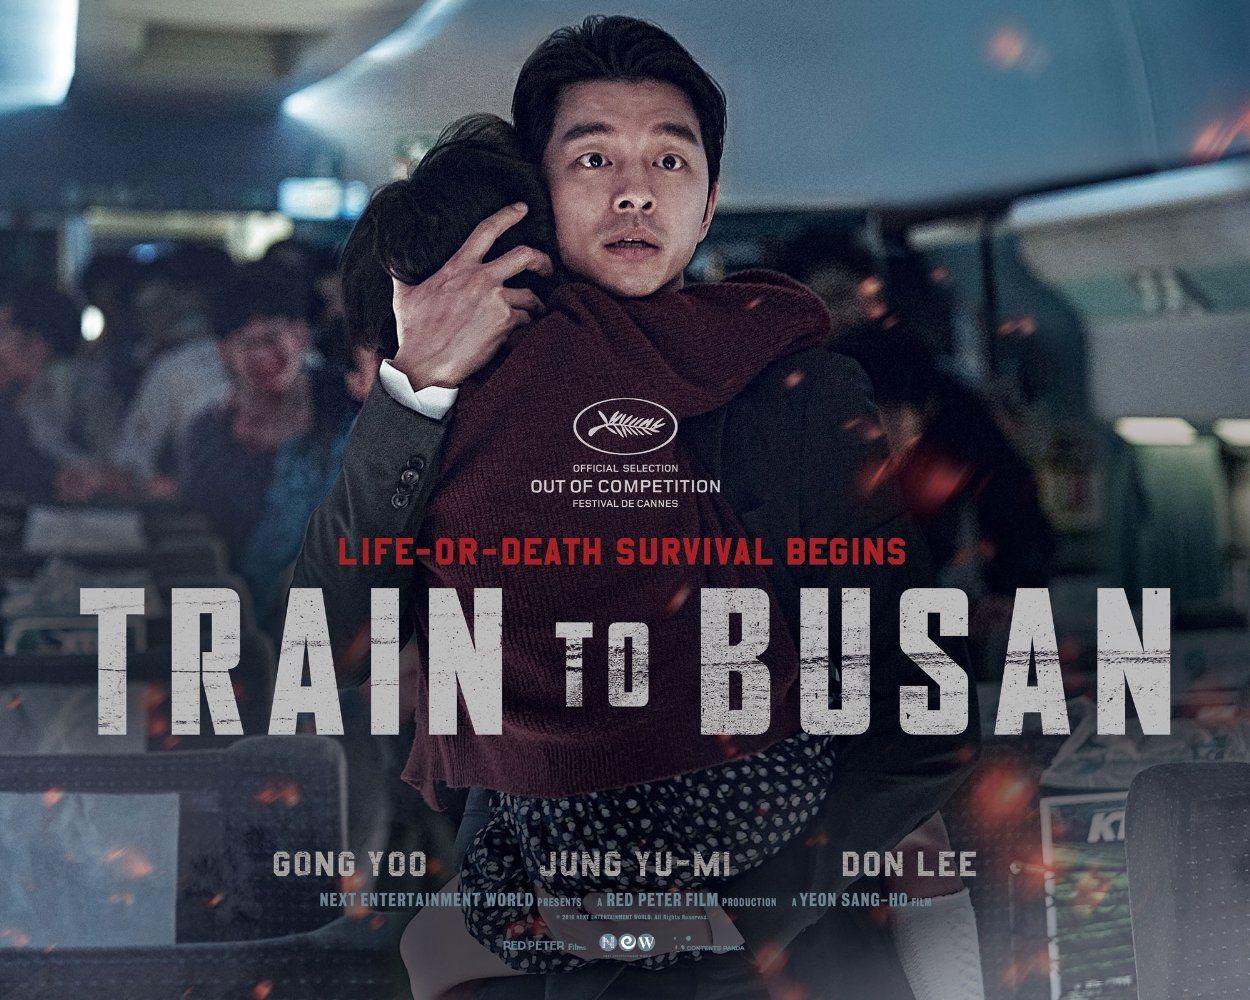 Train to Busan (2016) | Train to busan movie, Busan, Best zombie movies